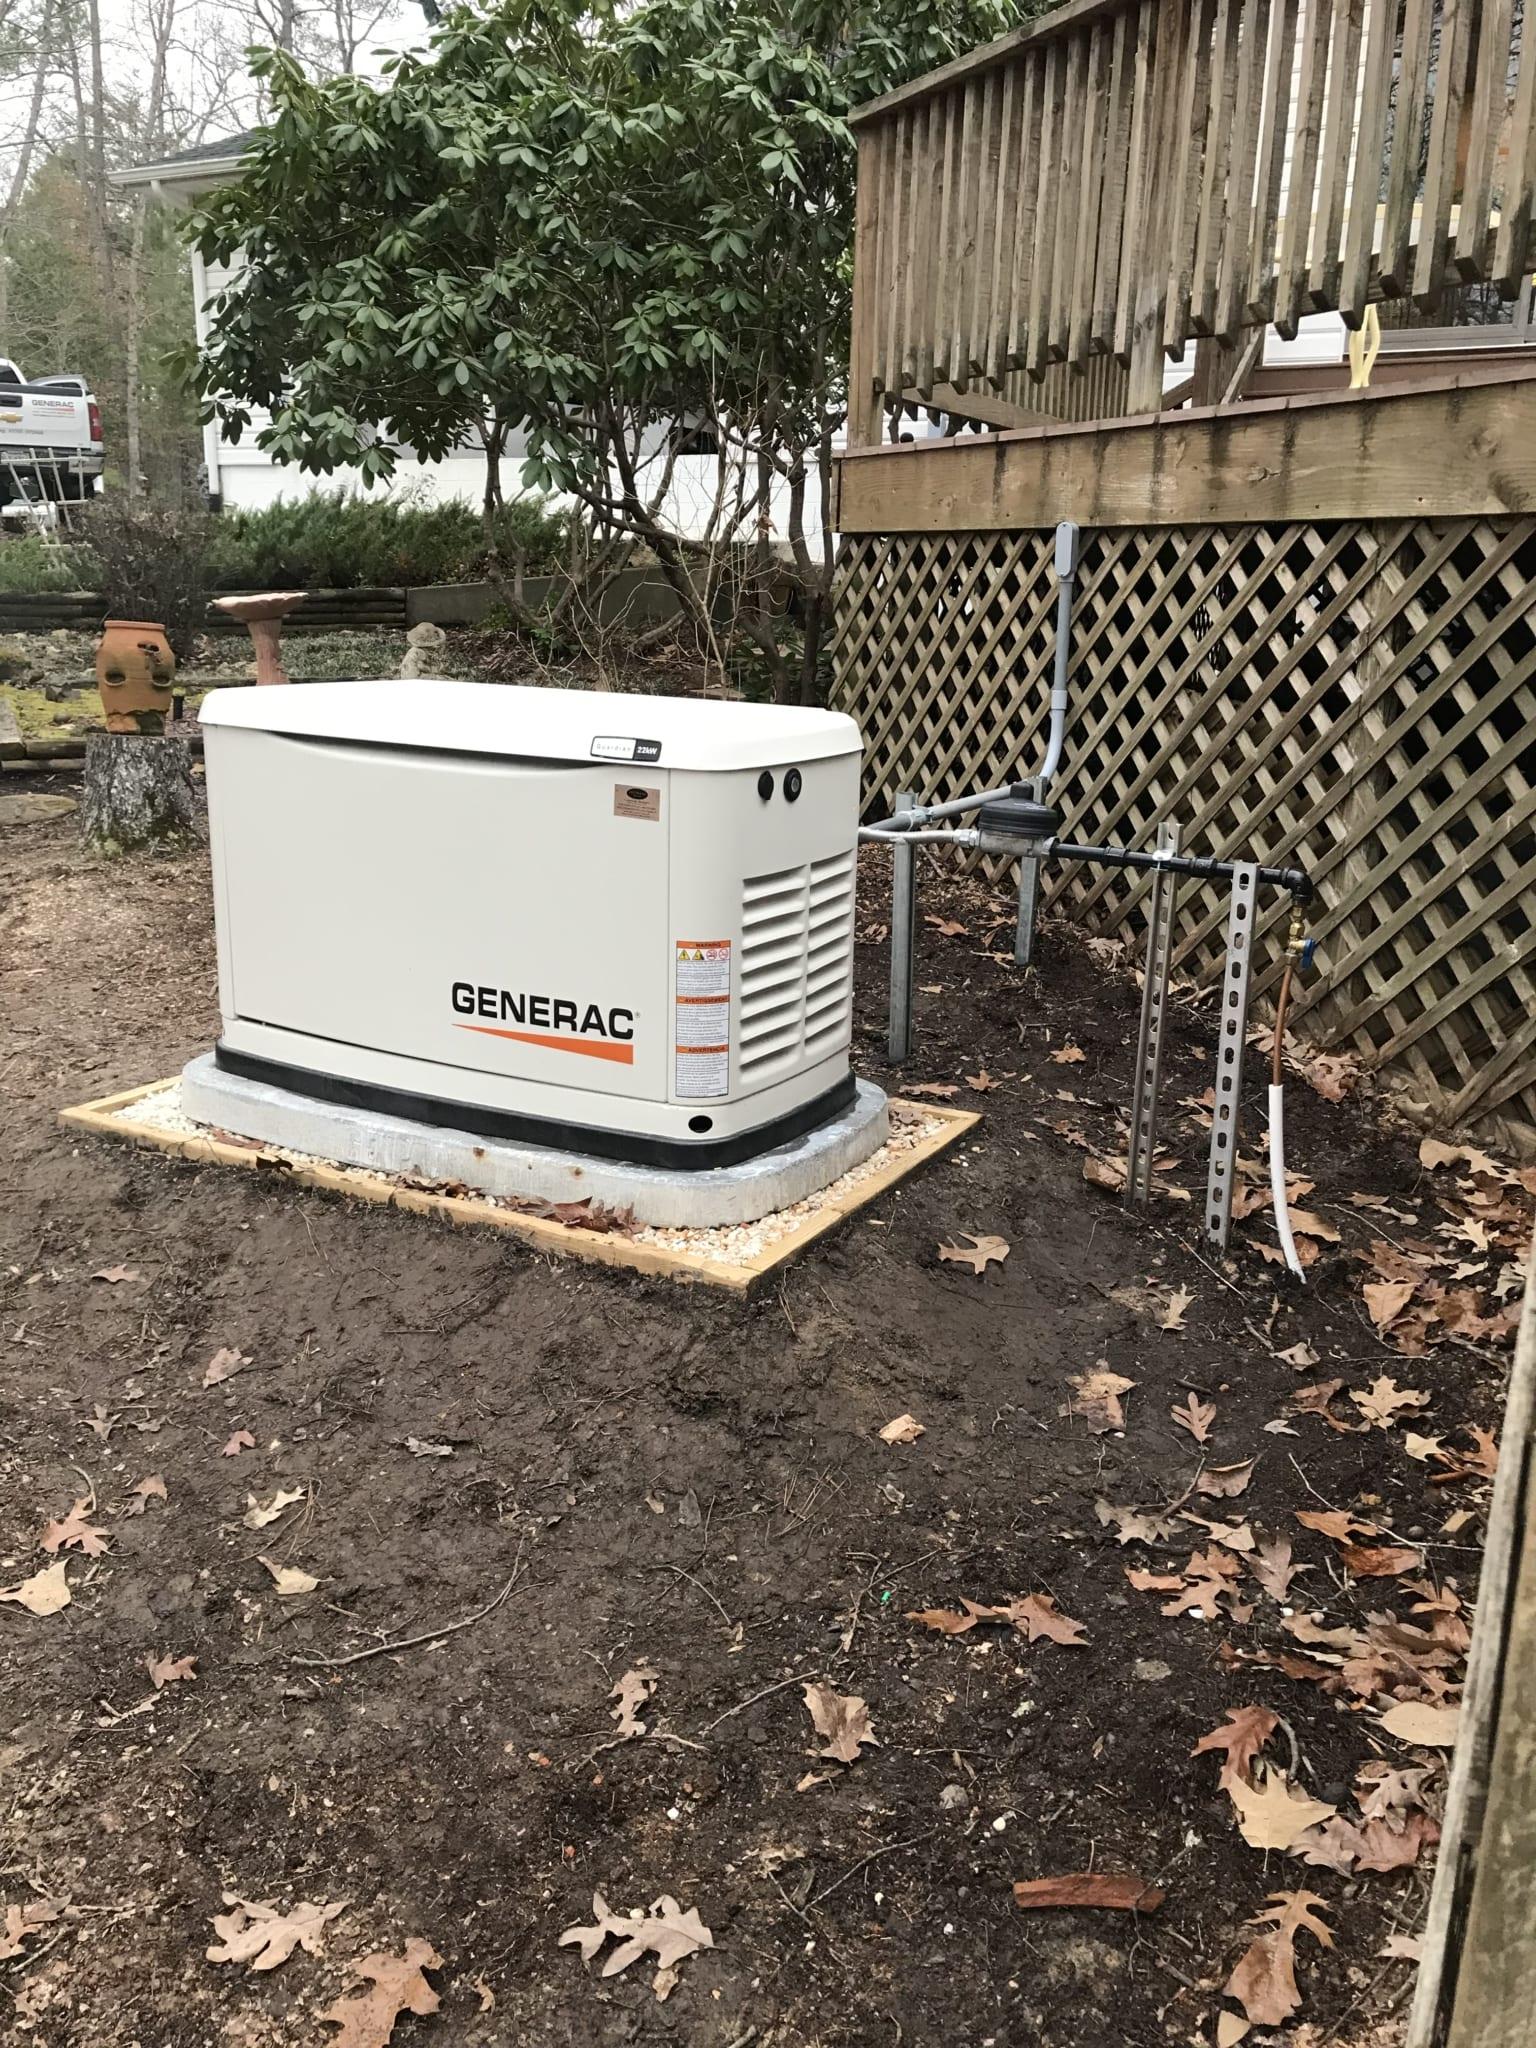 1.13.20 Prince George Generac Automatic Standby Generator